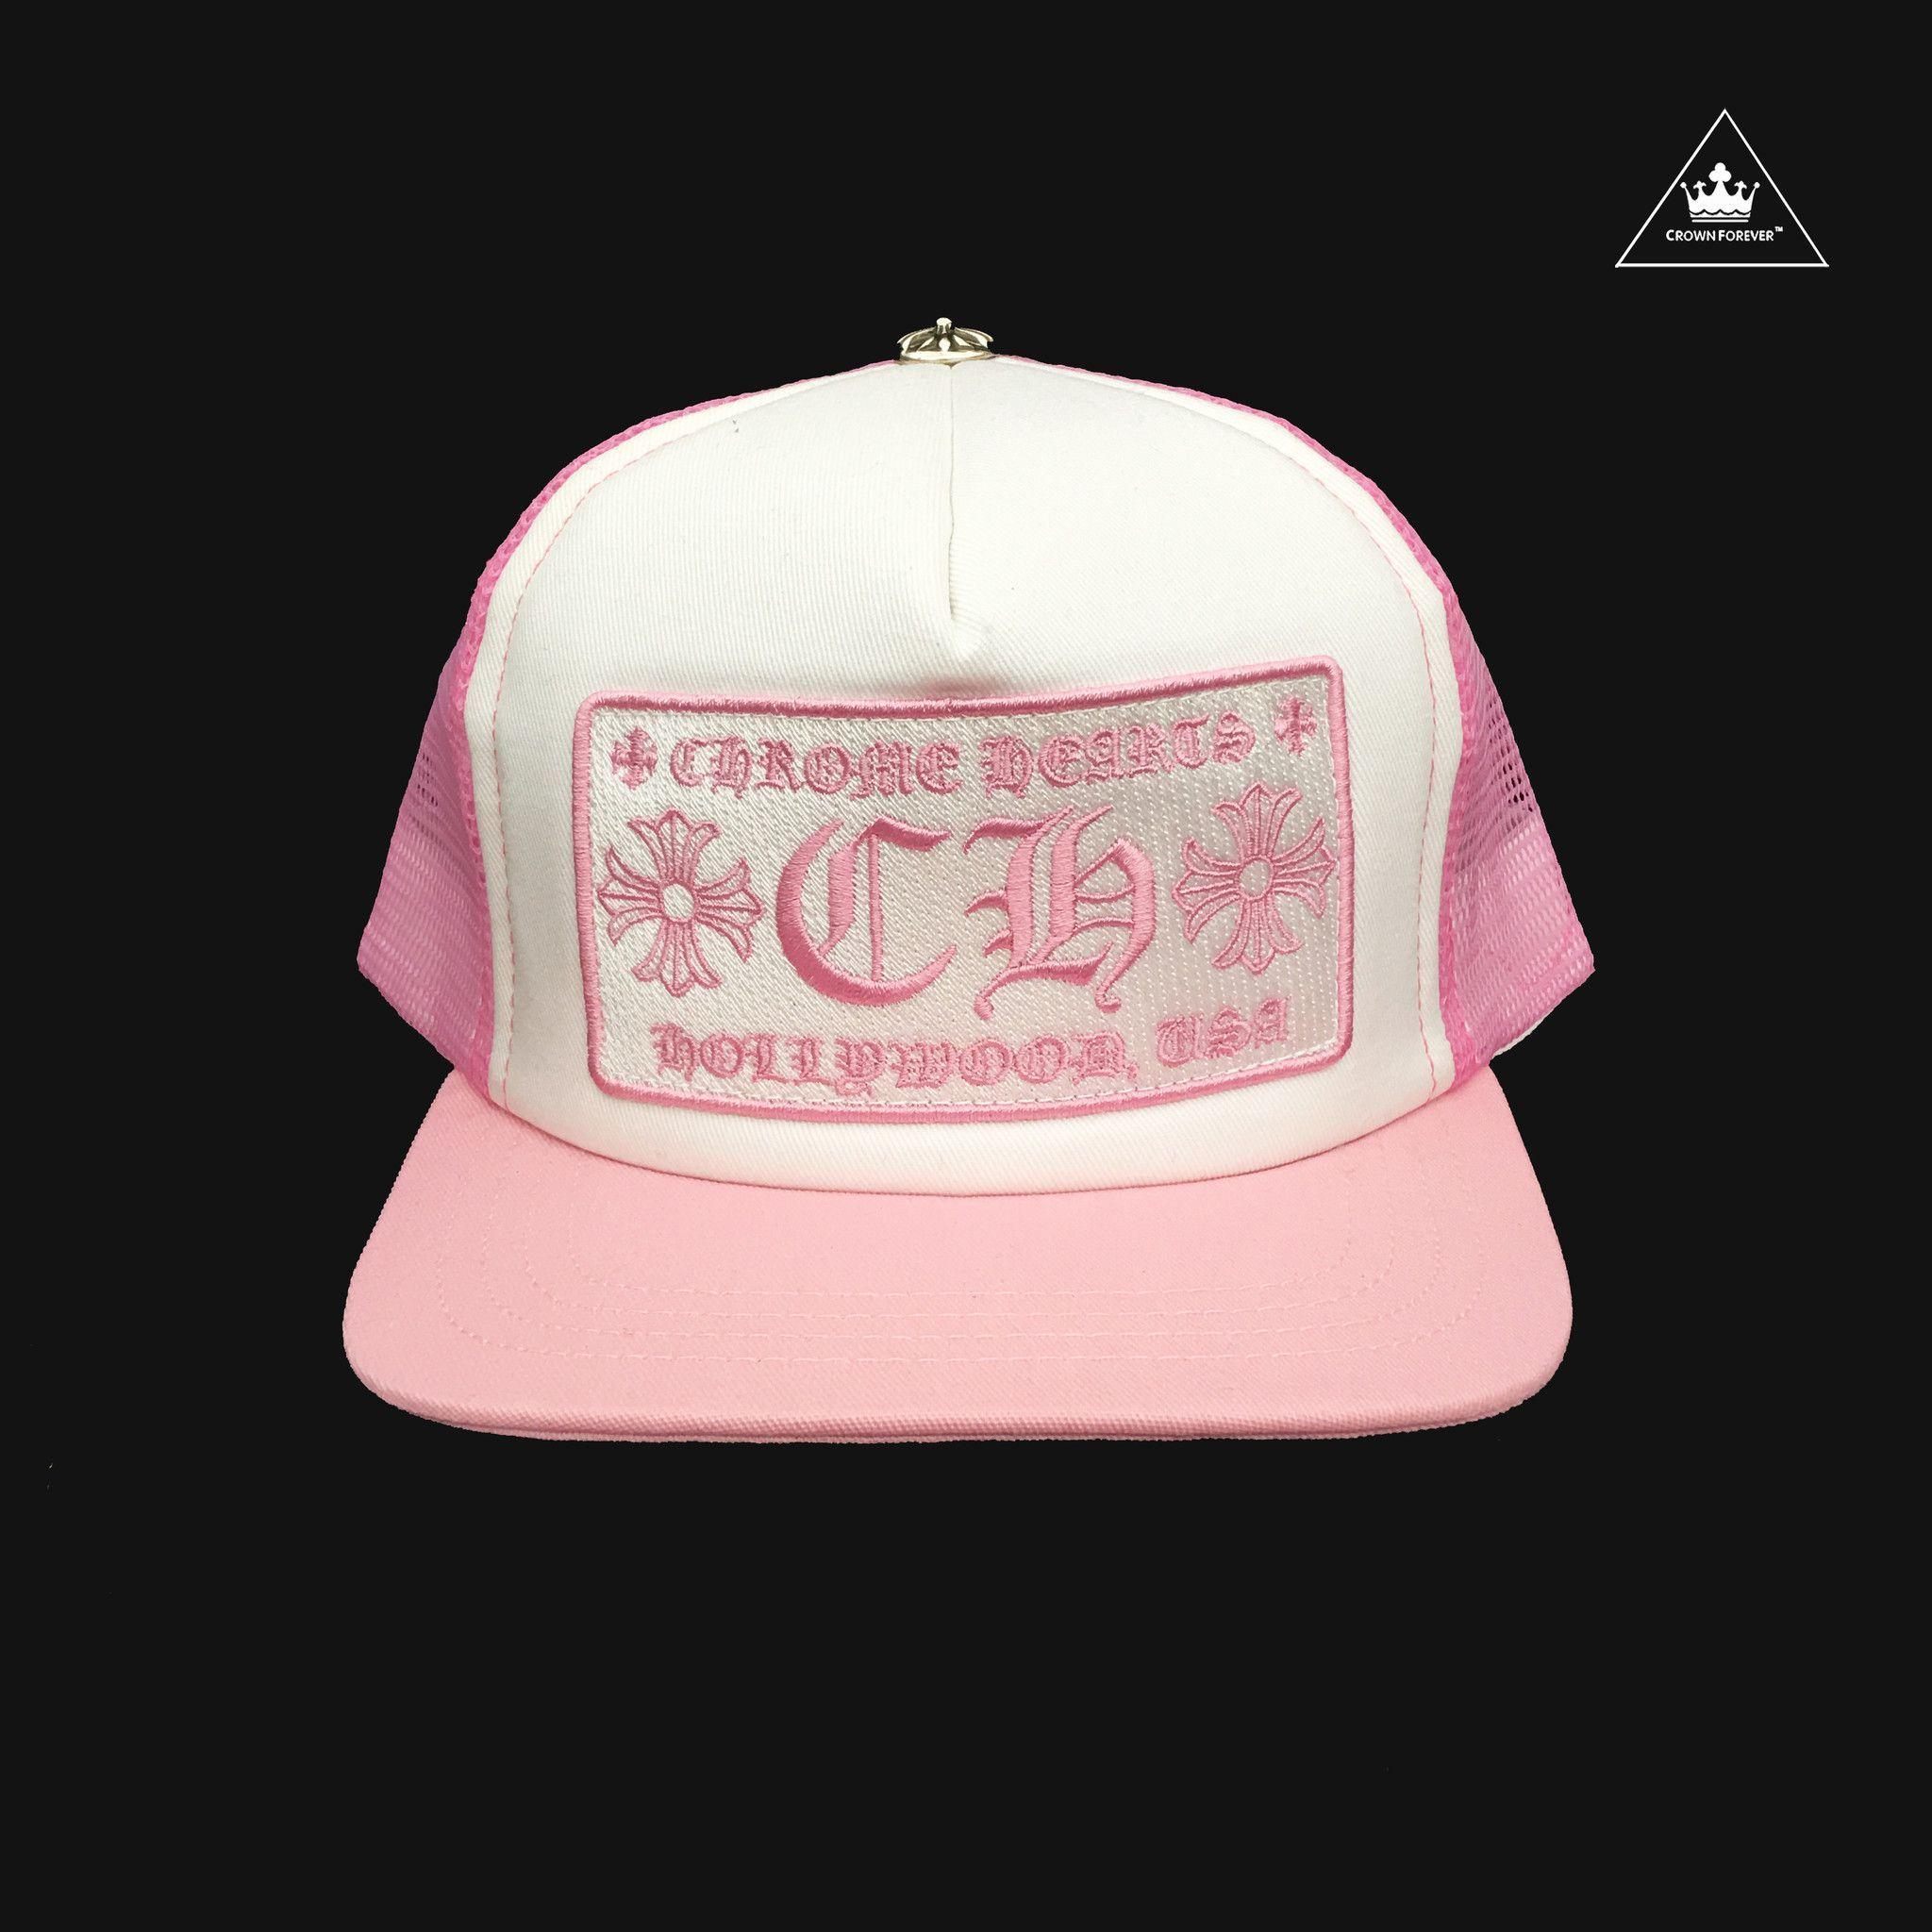 9f253b332 CH Hollywood Trucker Cap - Pink   Chrome Hearts Hats   Cap, Baseball ...